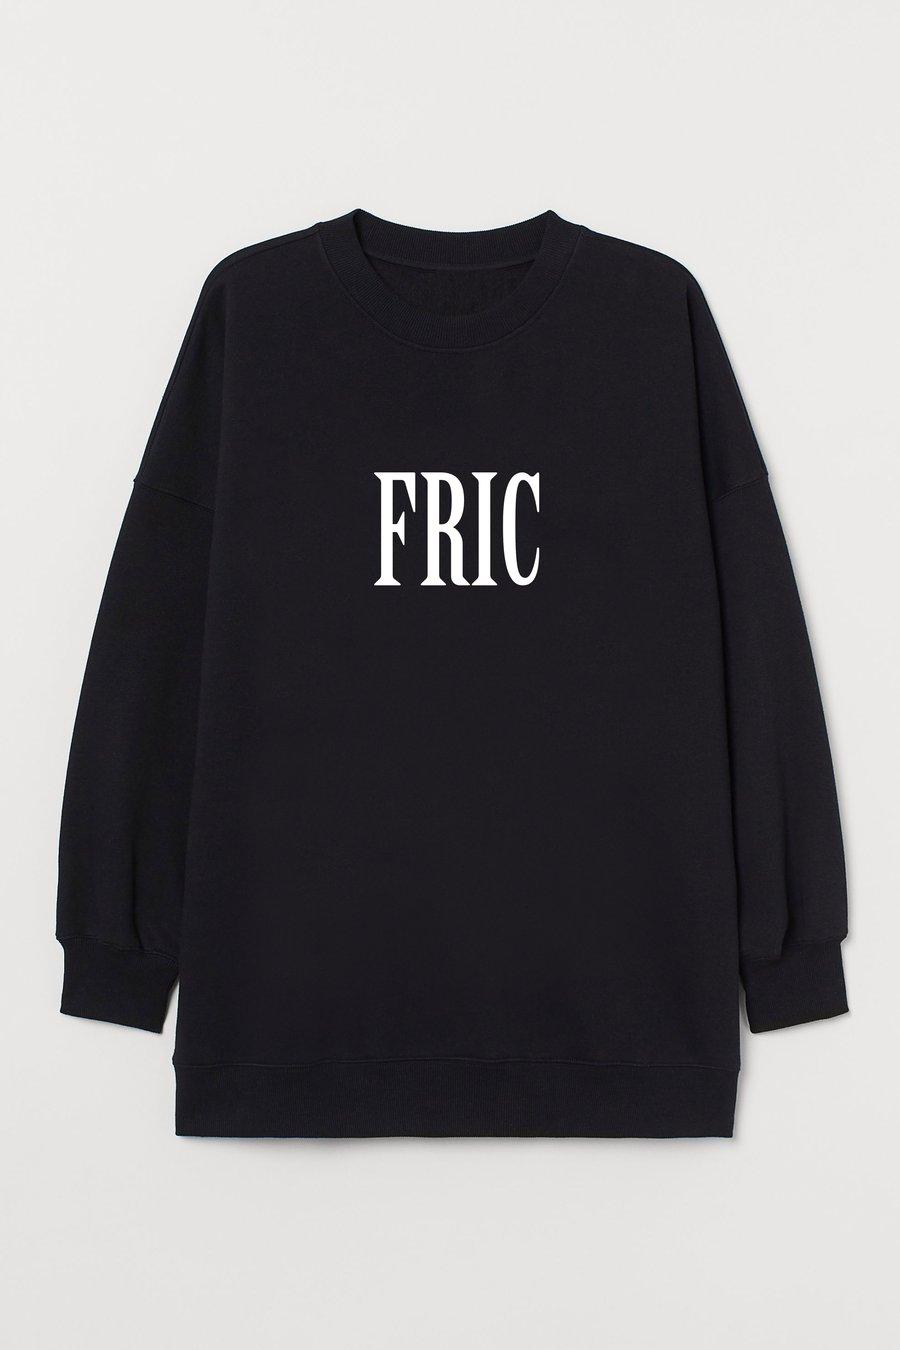 Image of Fric Crewneck IV